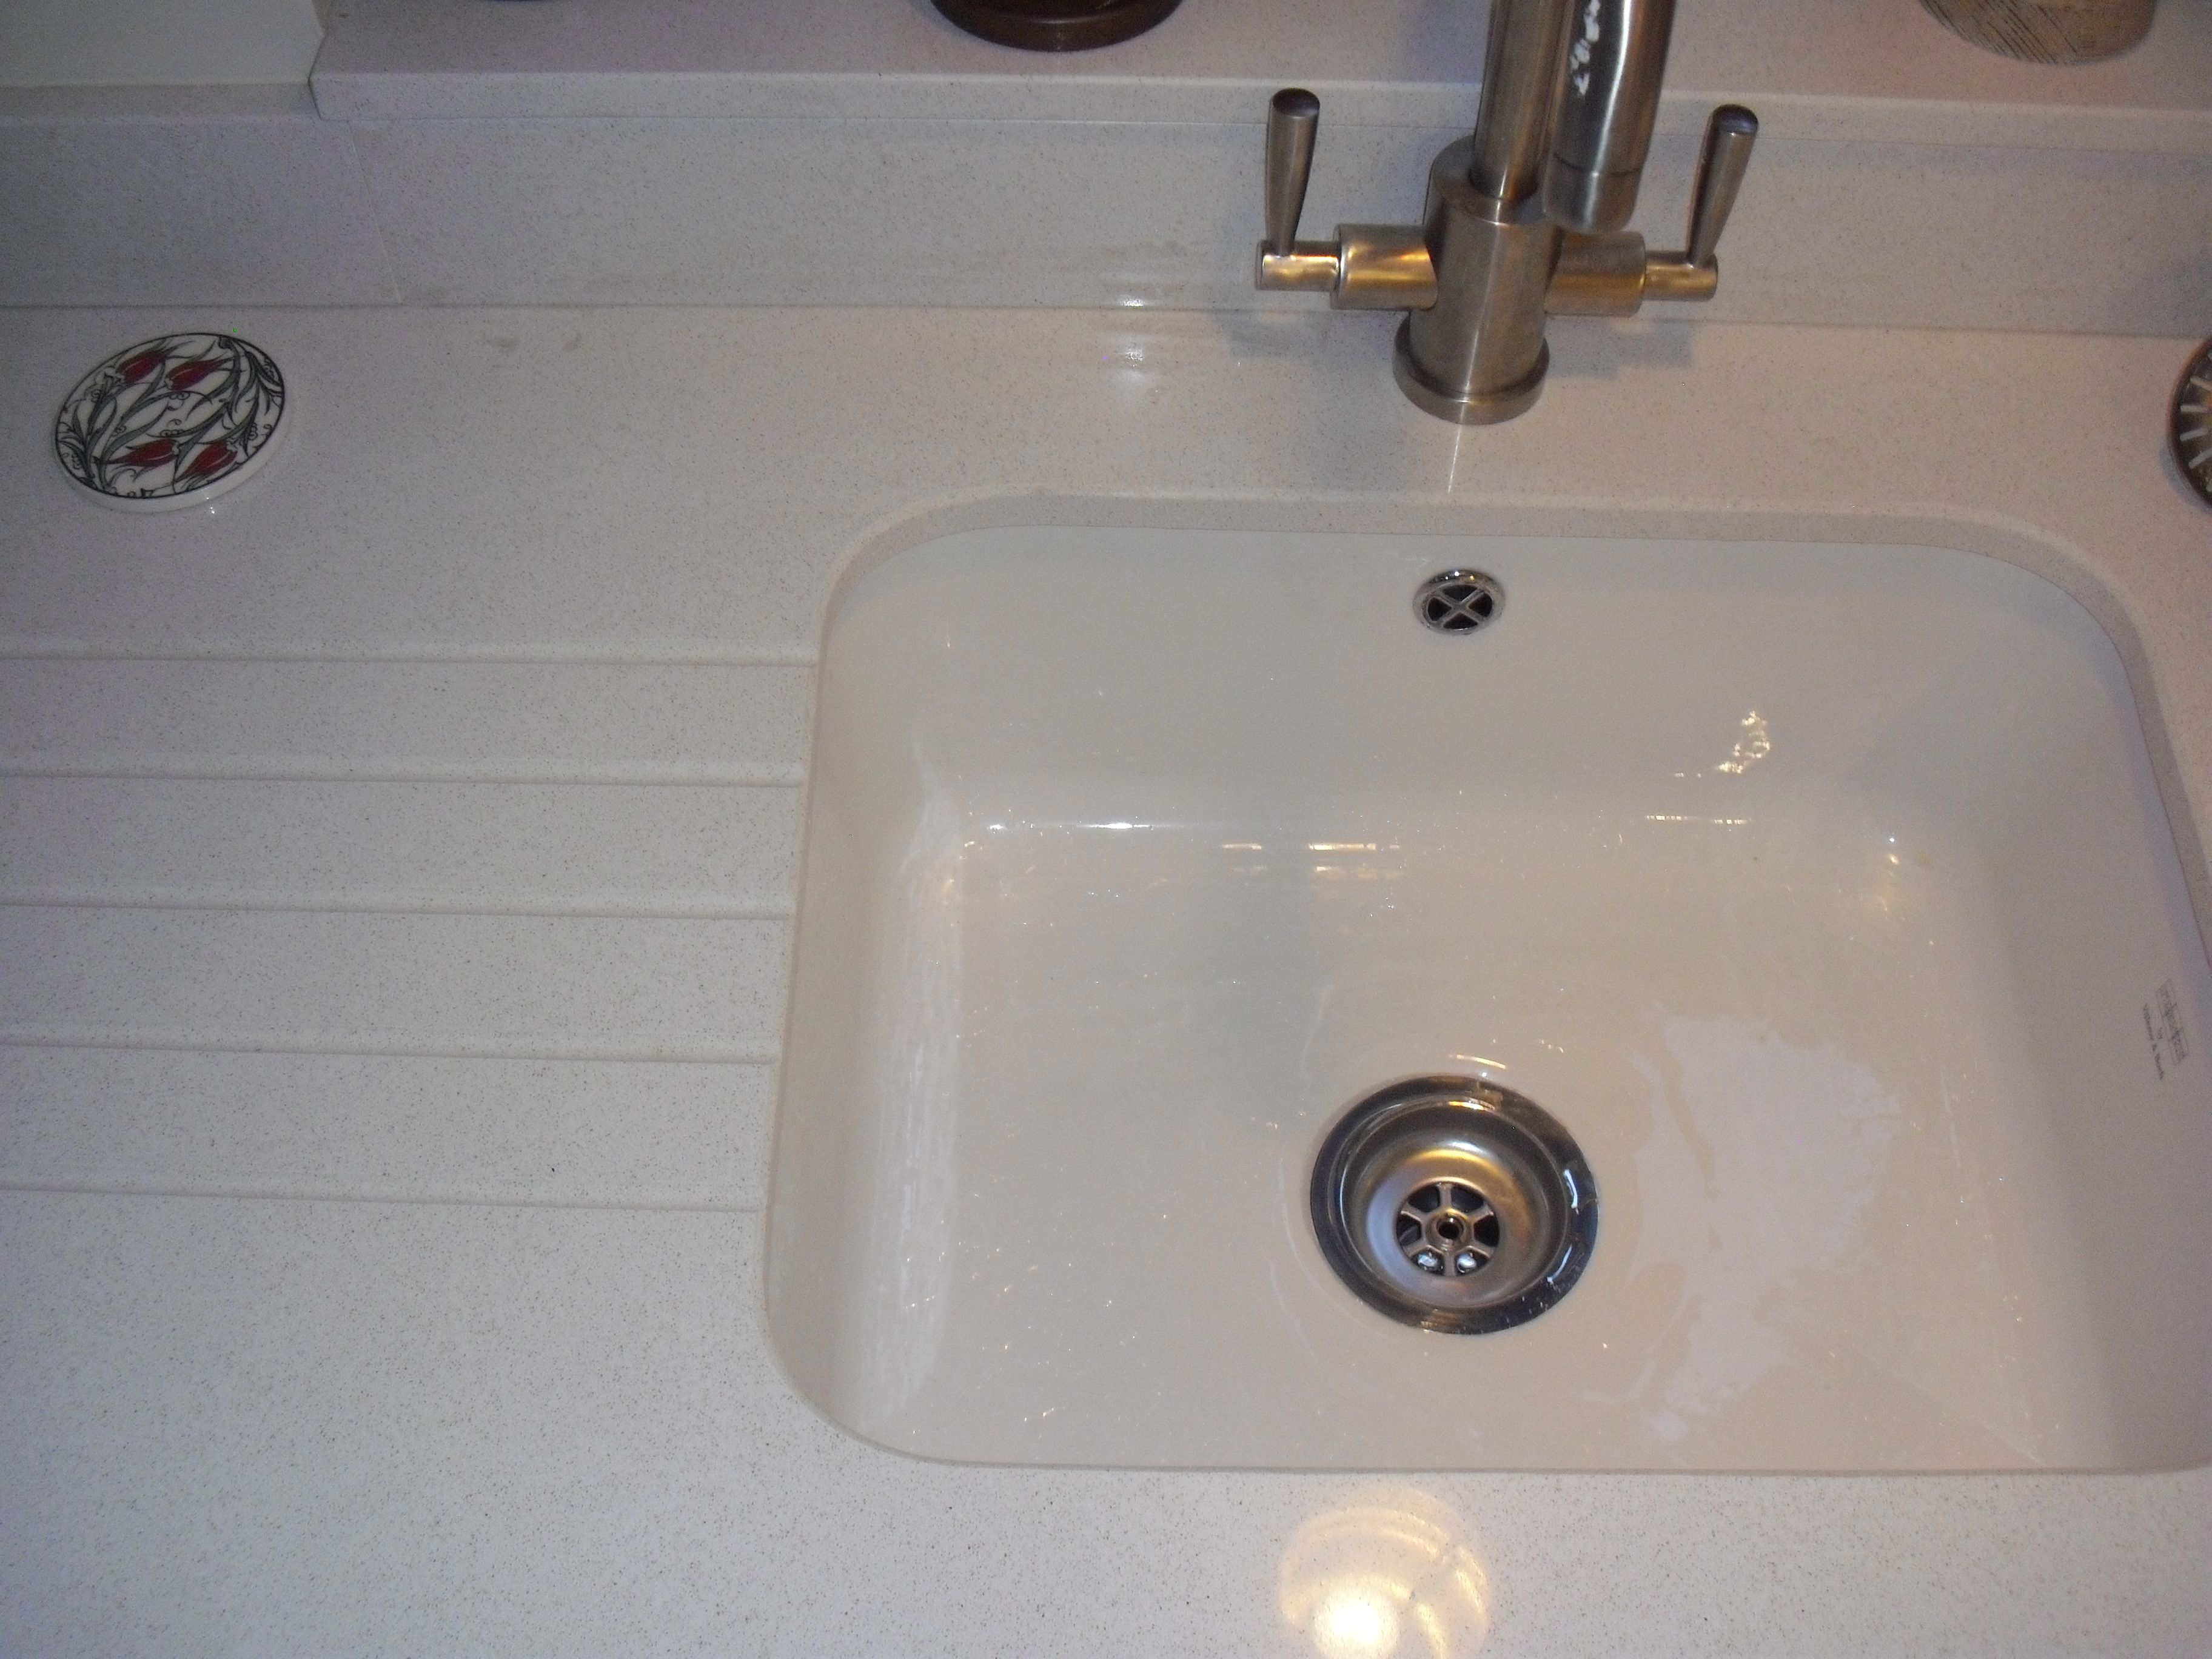 #BlancoNorte Quartz From #Silestone. Ceramic #undermount Sink With  #drainergrooves